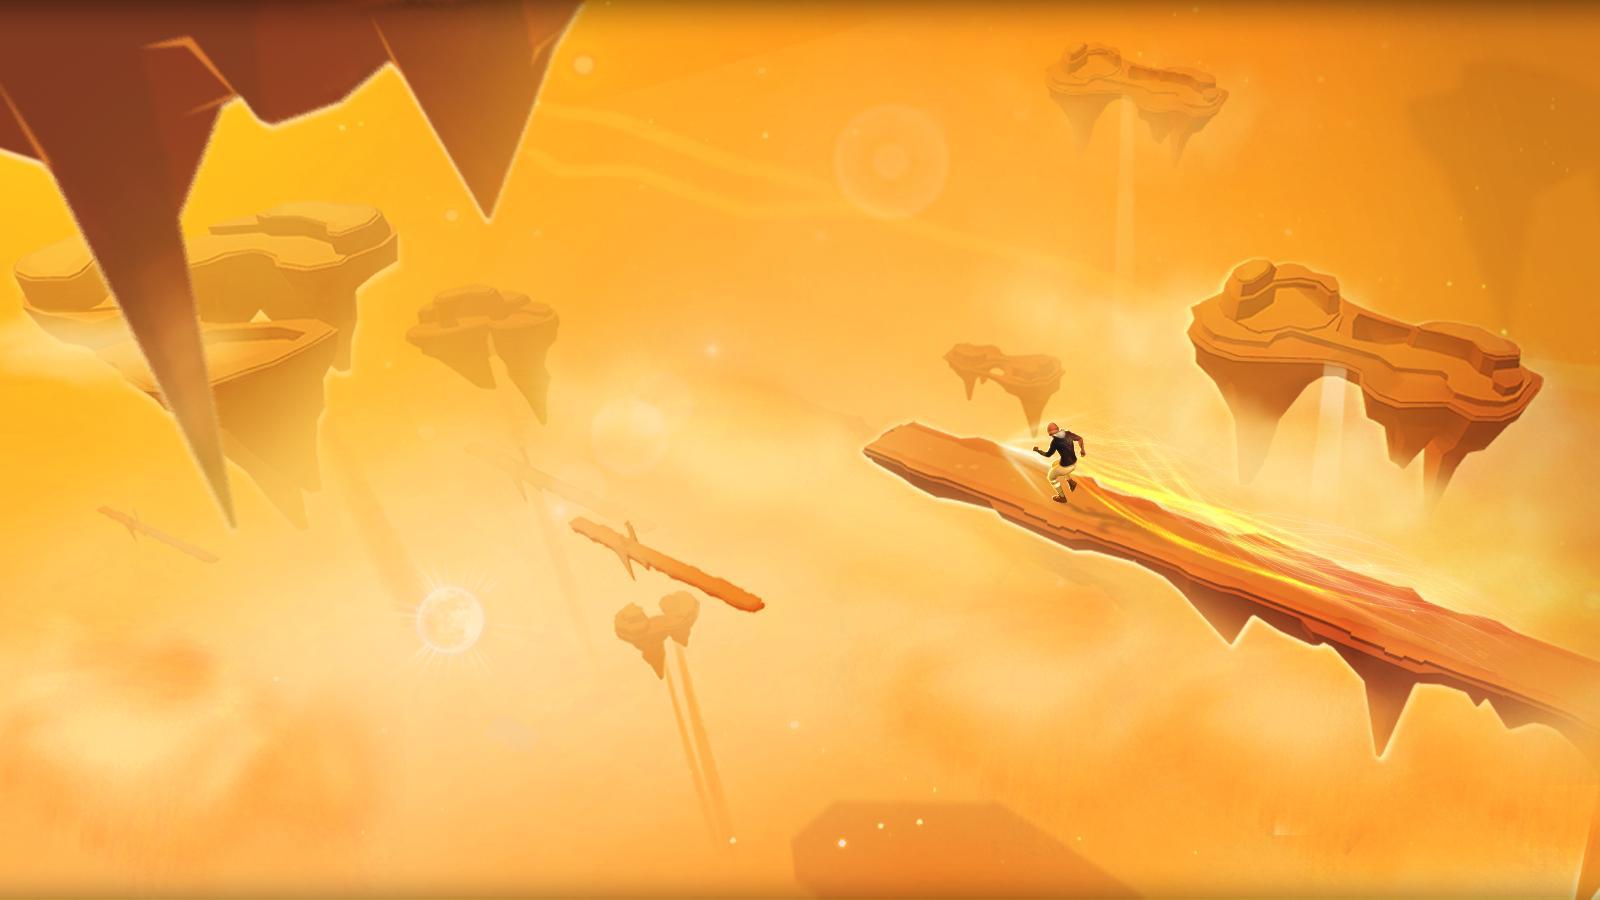 Sky Dancer Run - Running Game 4.2.0 Screenshot 6